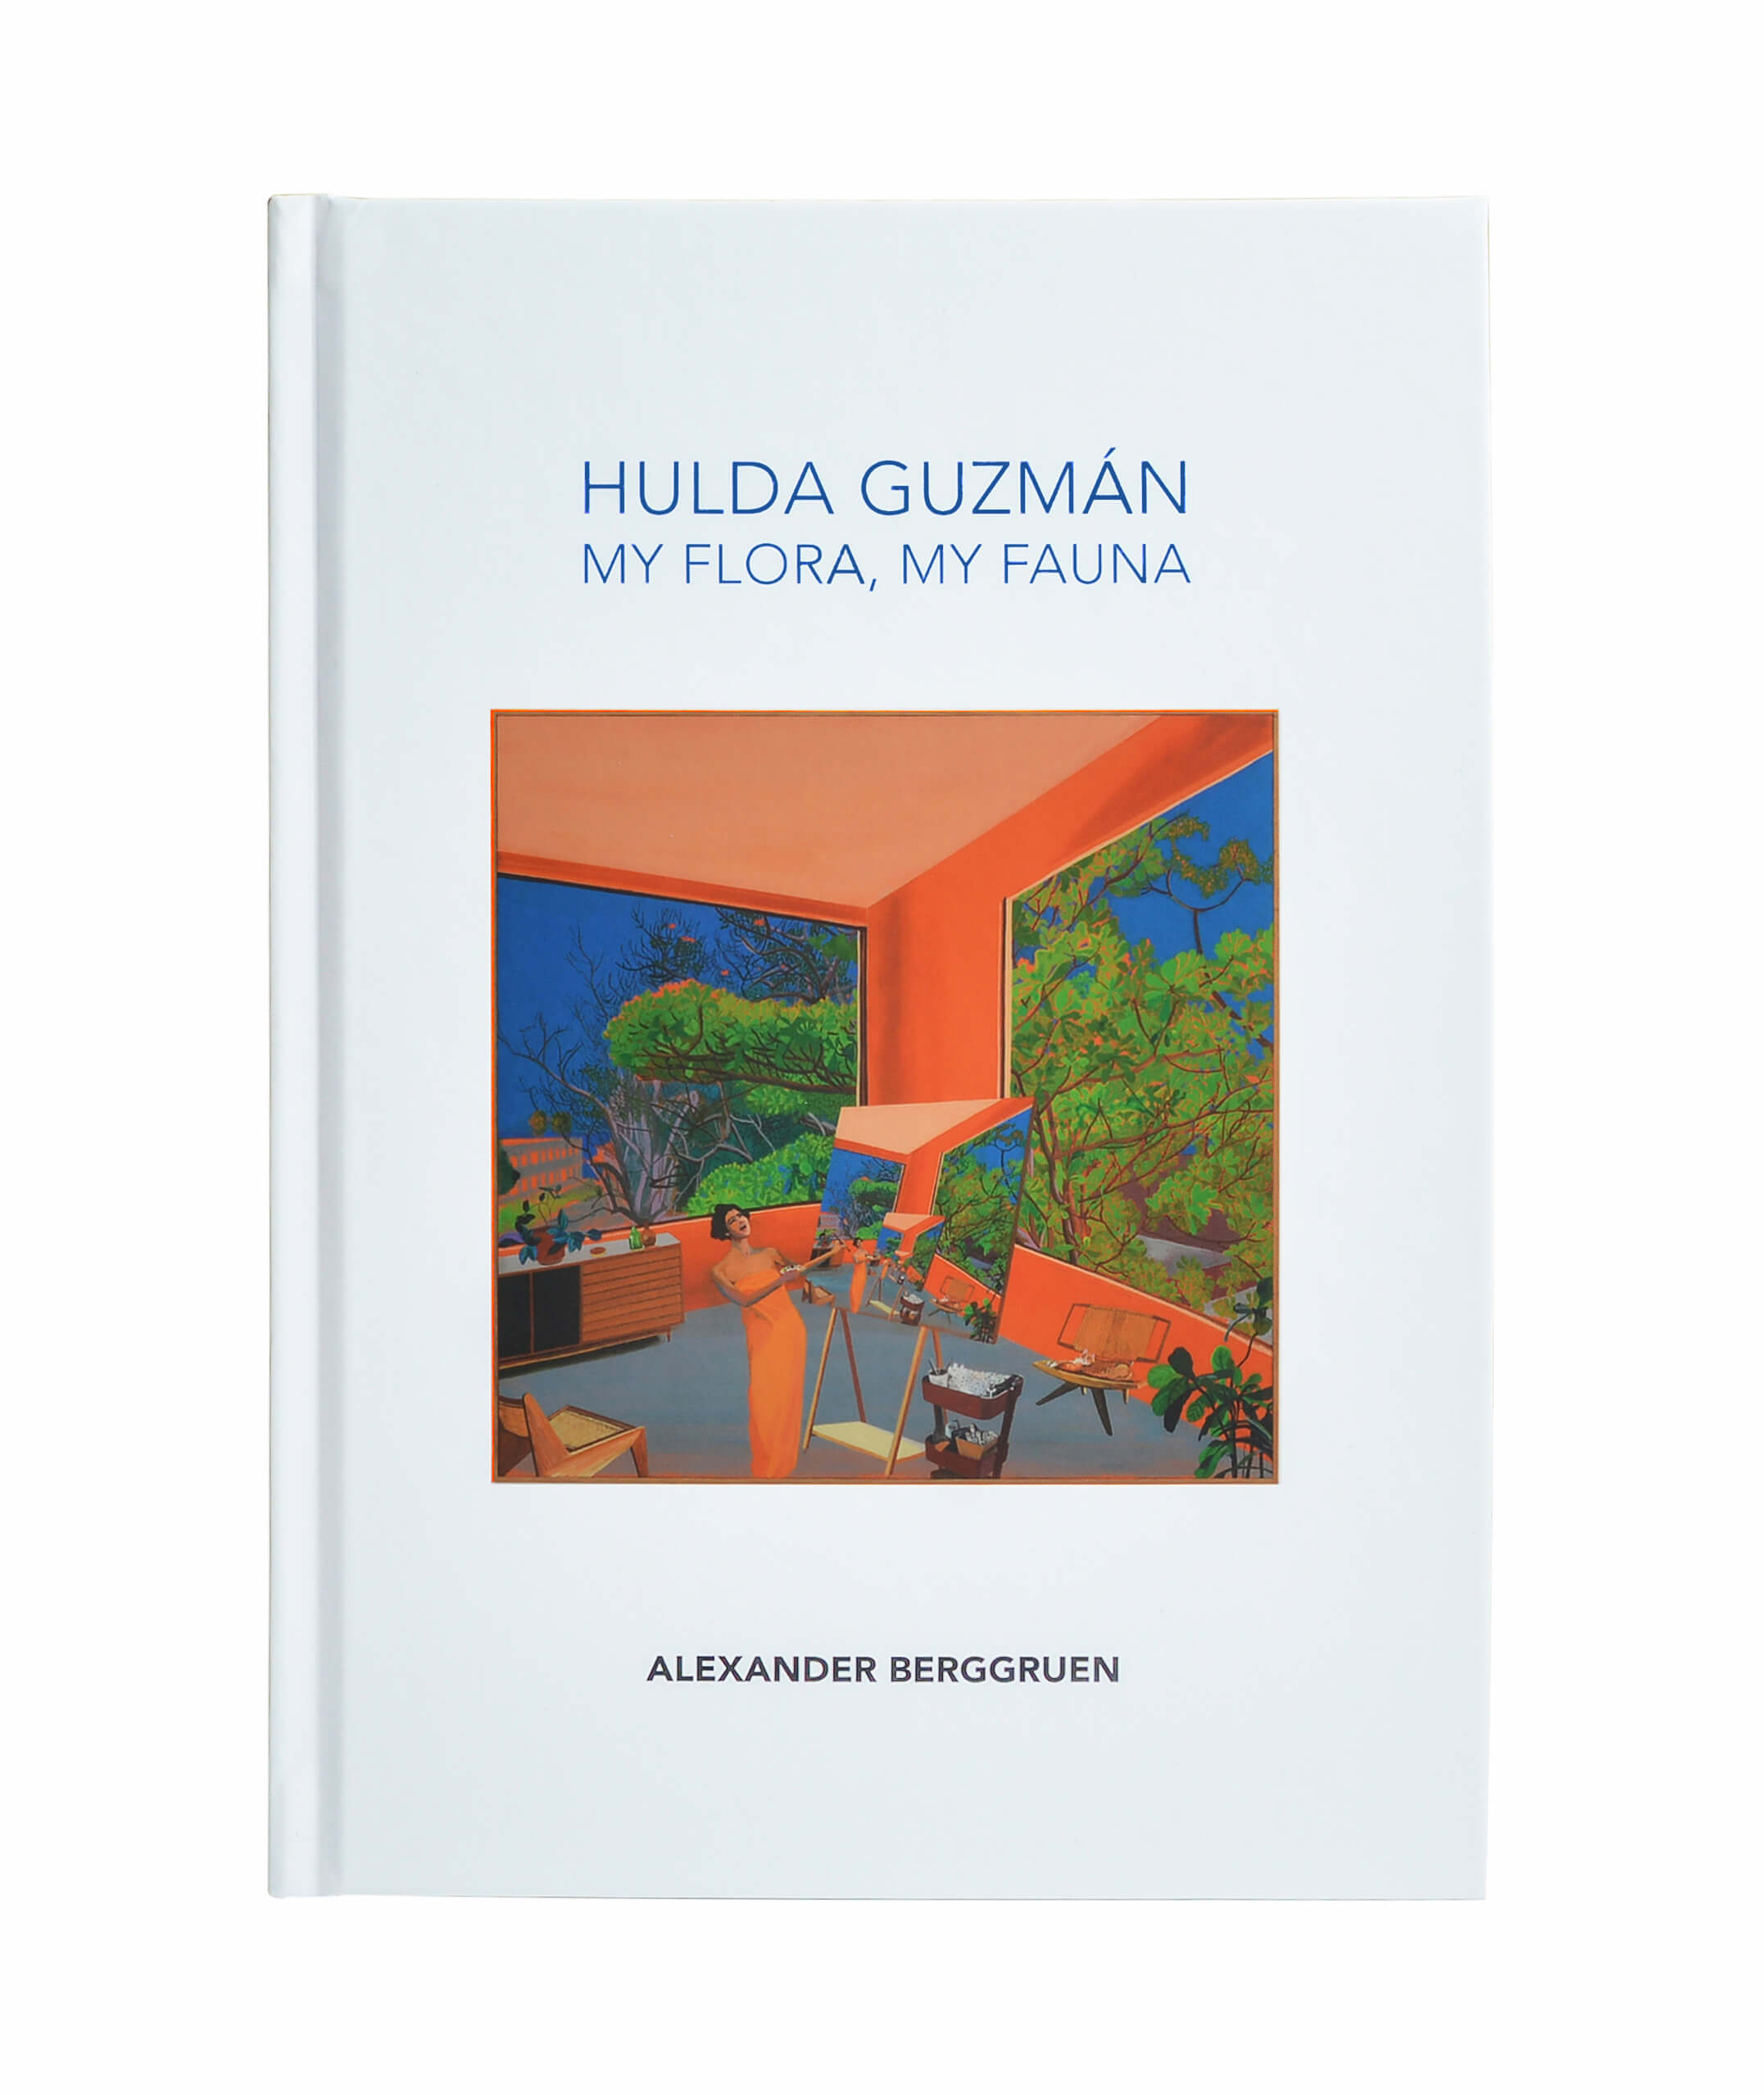 Hulda Guzmán: my flora, my fauna Exhibition Catalogue Product Photography